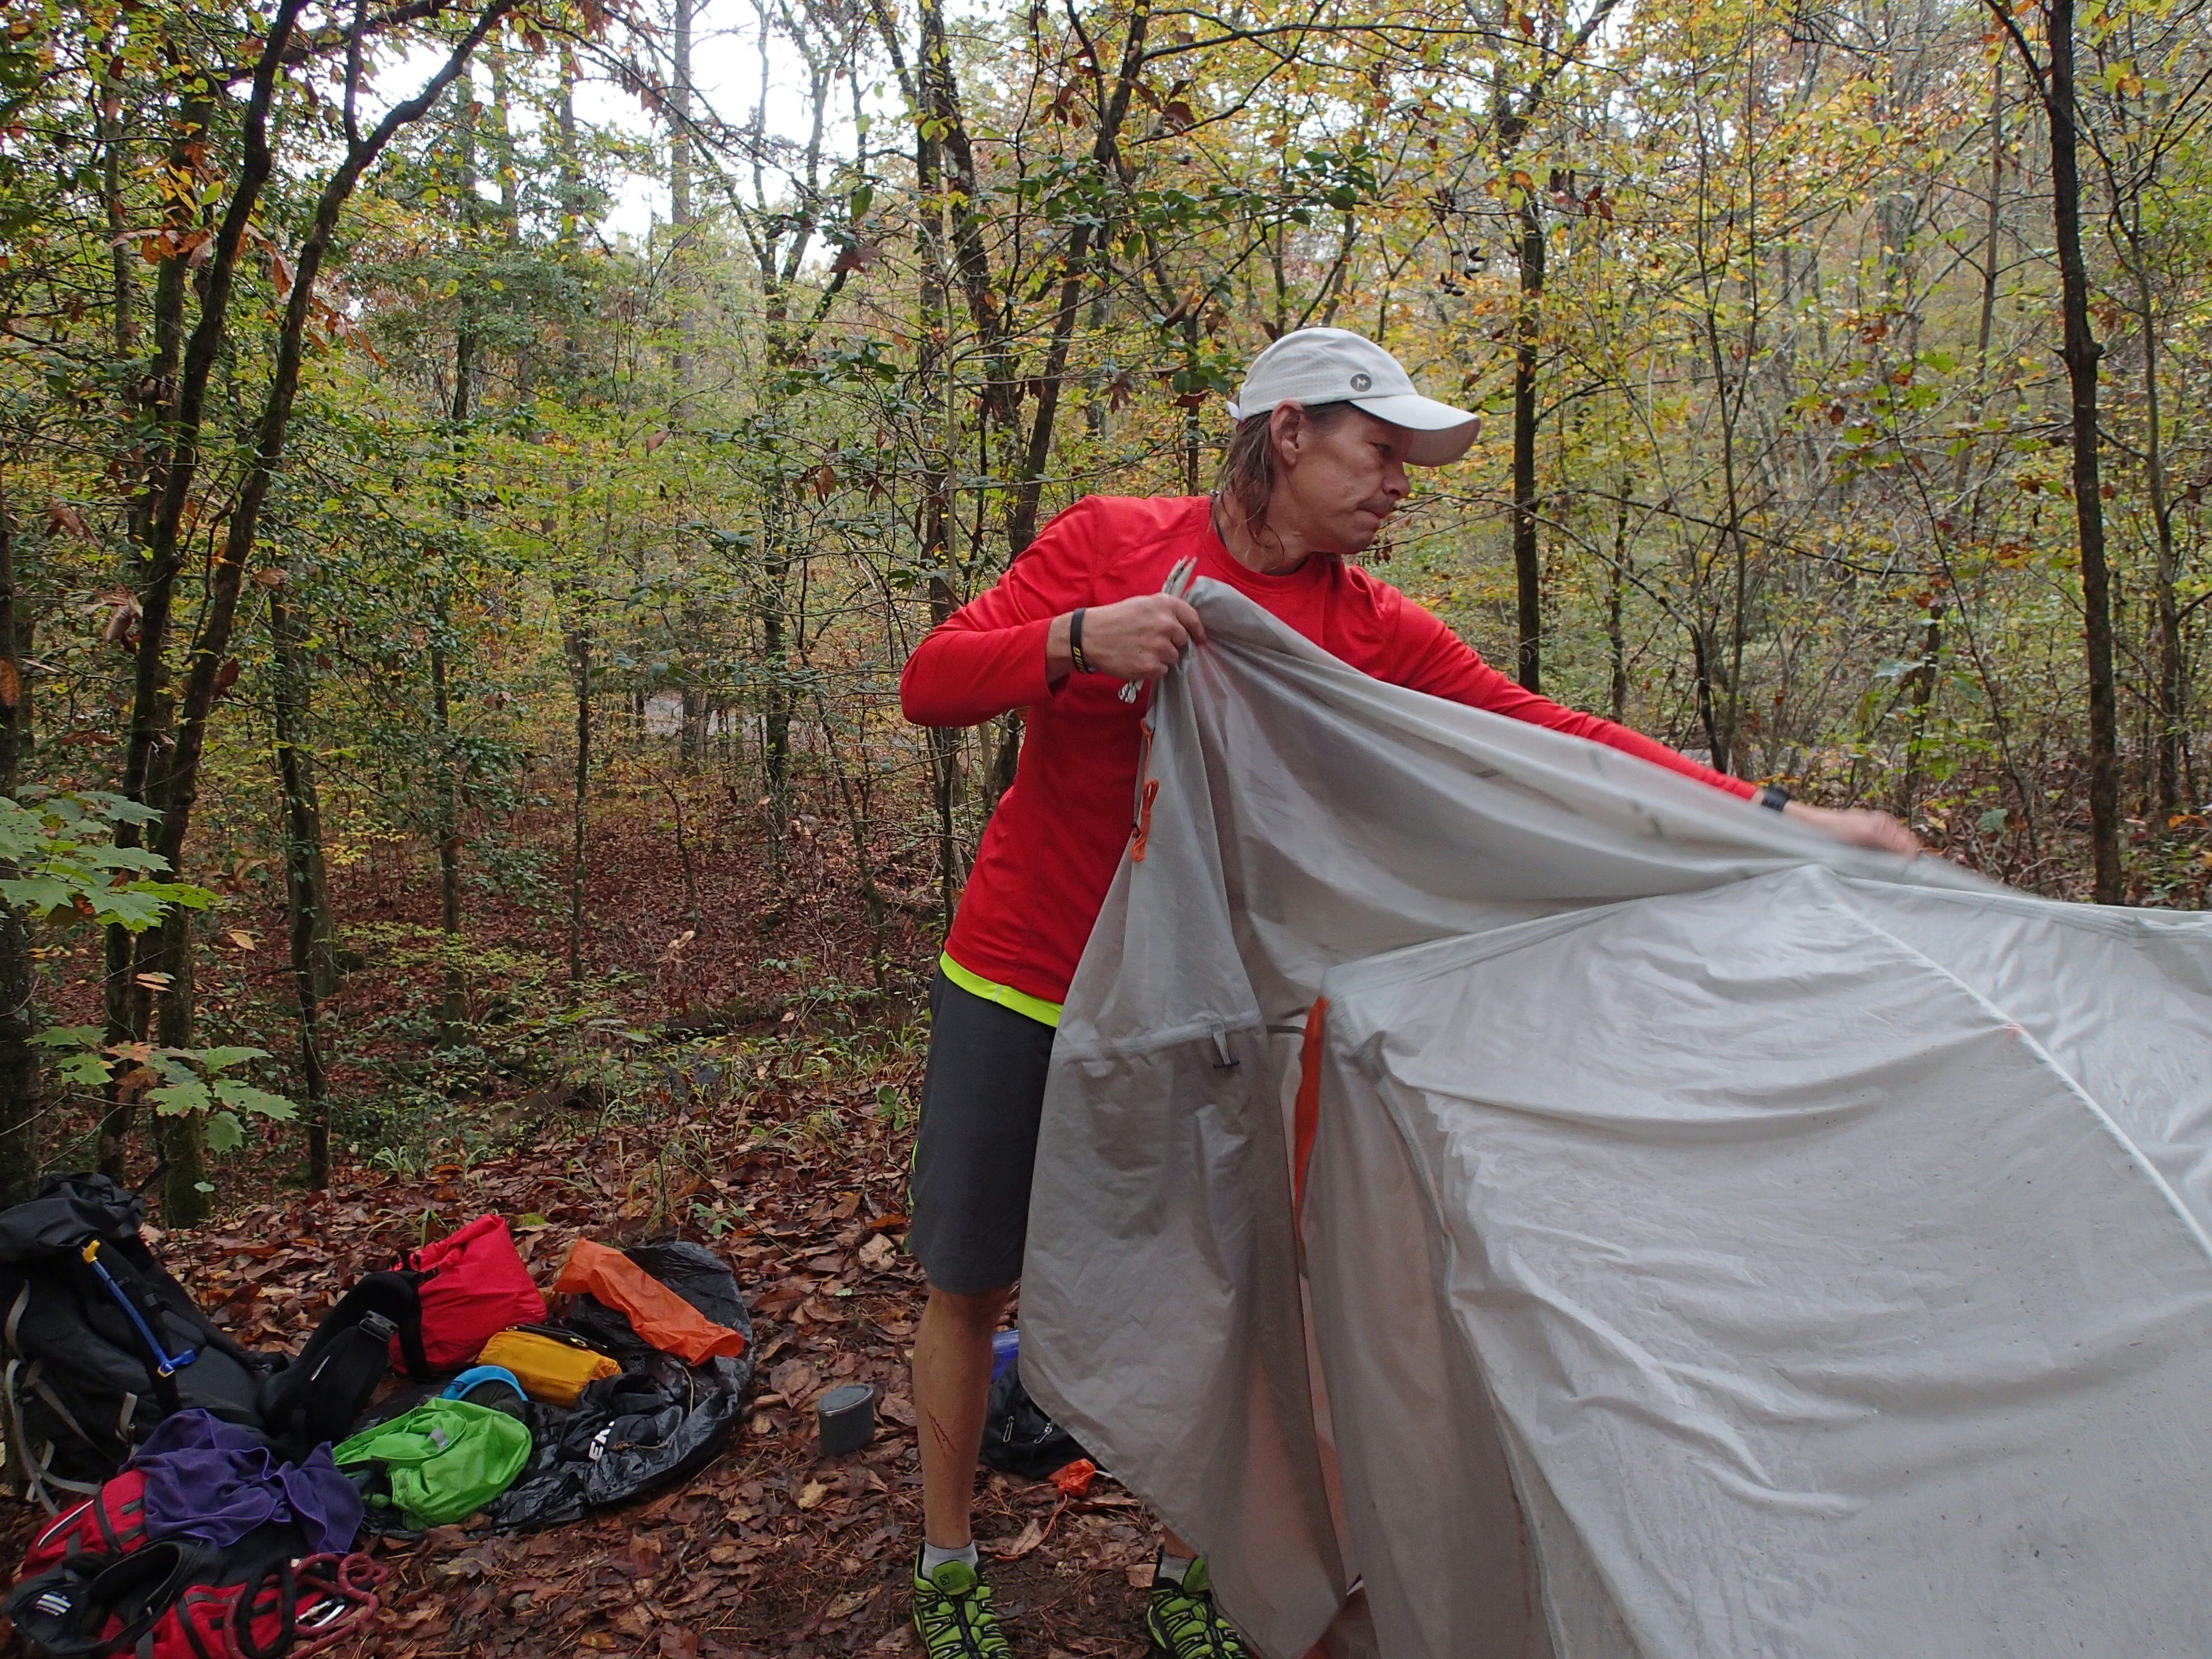 Trevor Thomas setting up camp